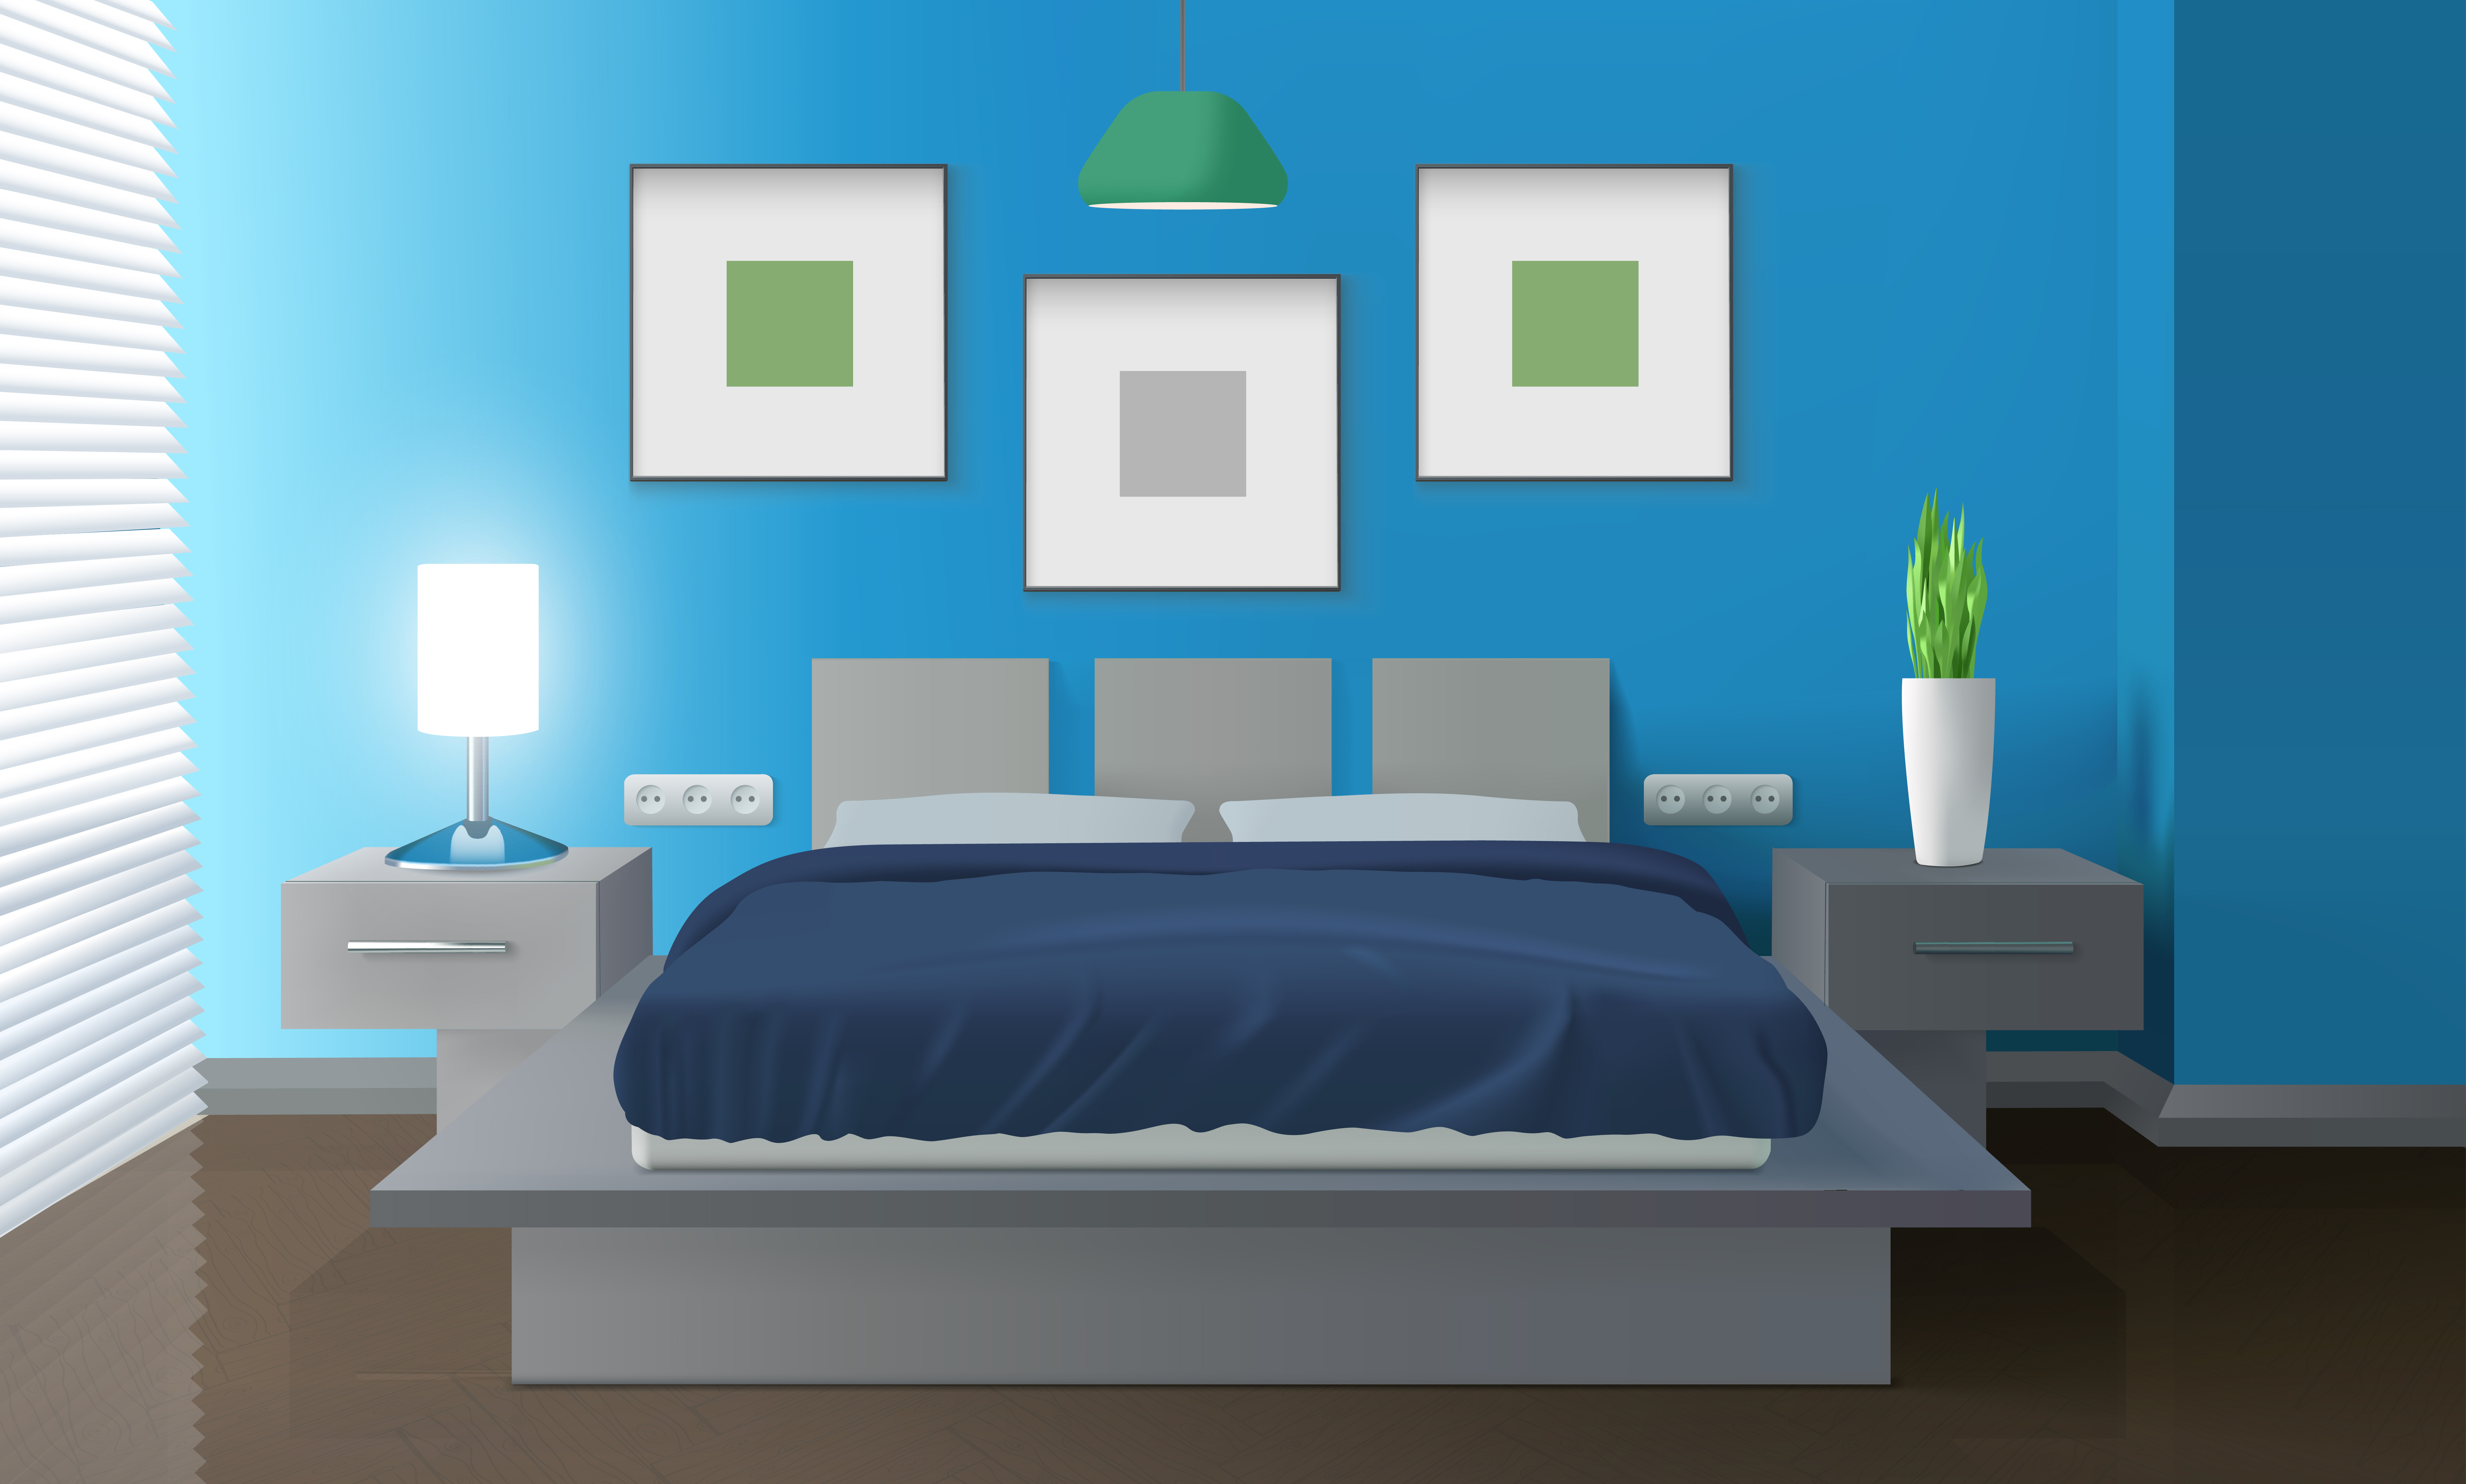 Modern Bedroom Blue Interior - Download Free Vectors, Clipart